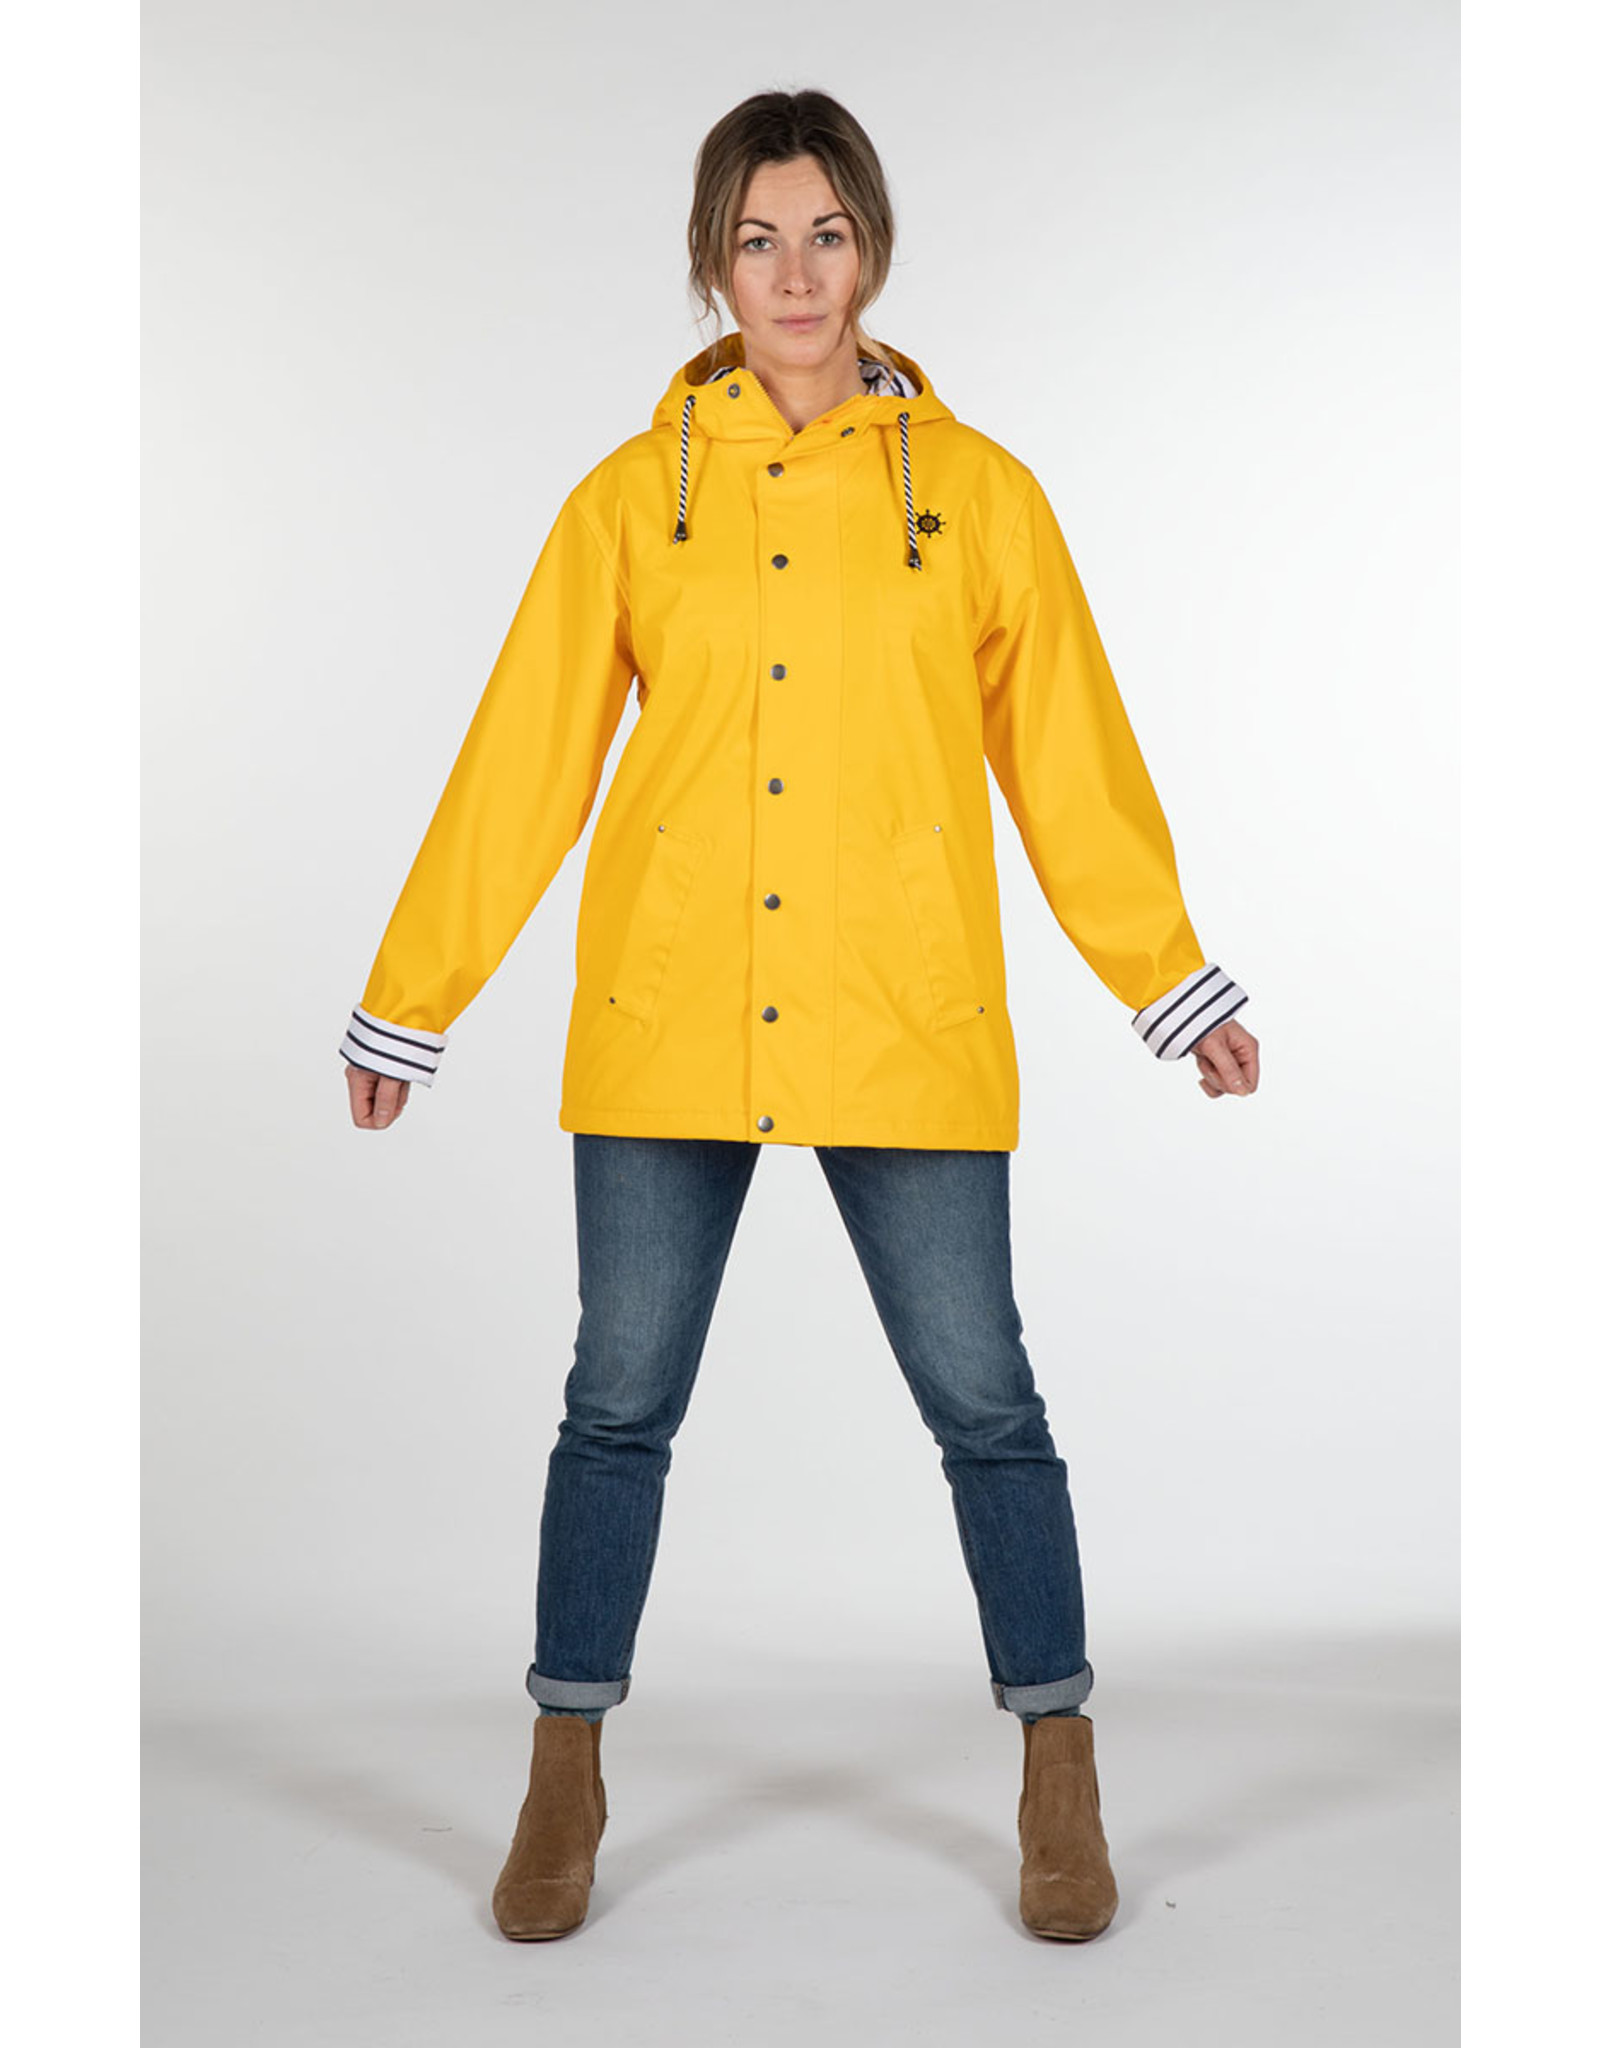 ANO - Gender Free Waterproof Raincoat/ Yellow or Navy Blue